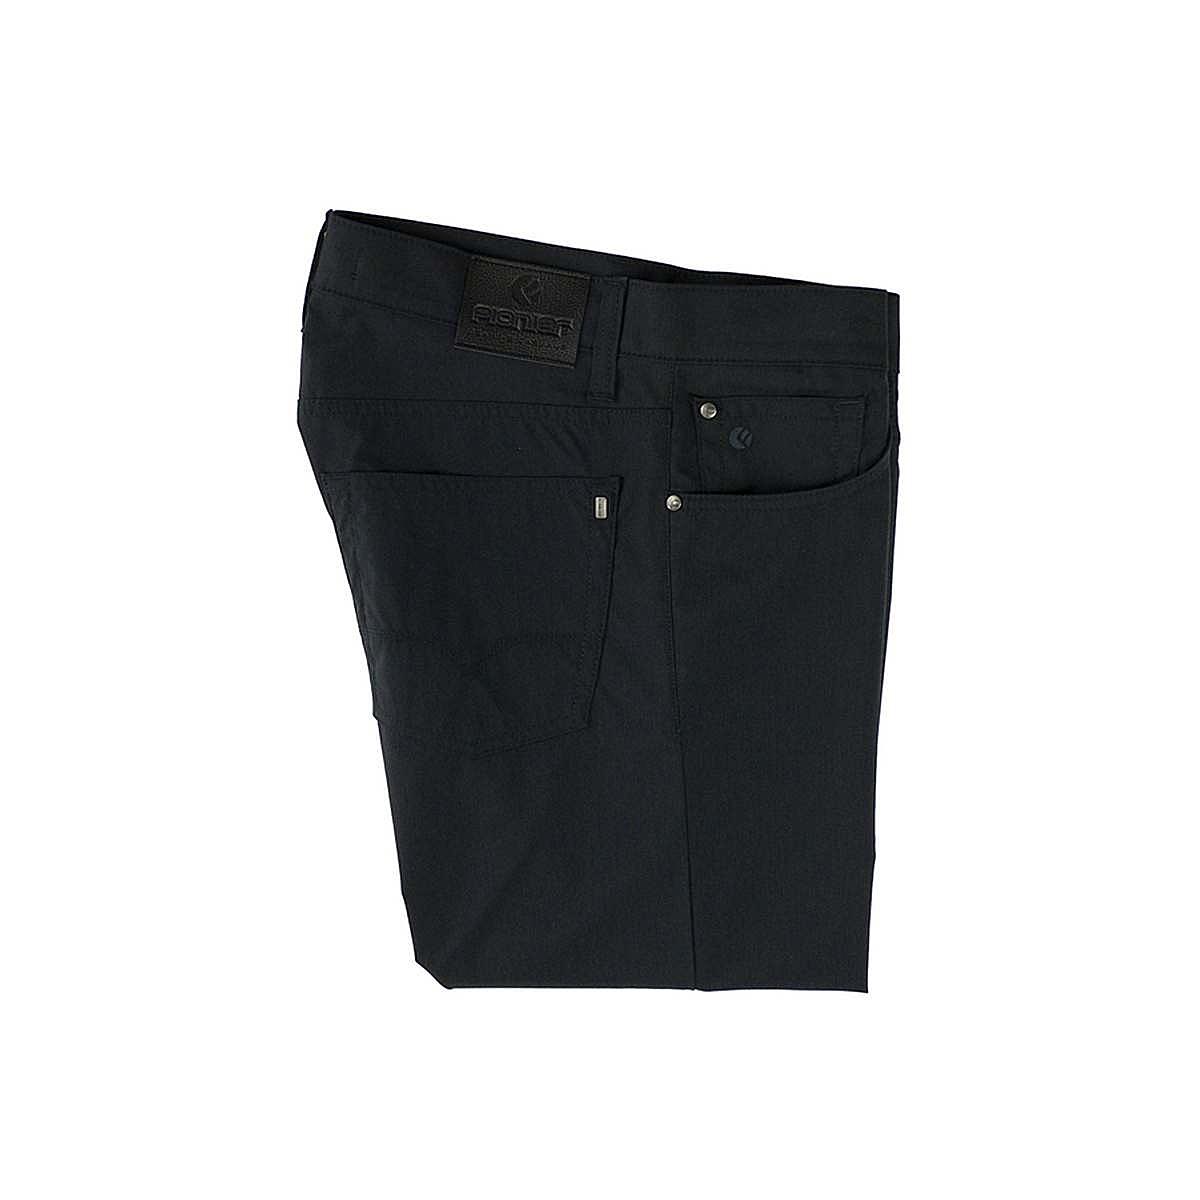 405e54e9652e Sportswear Carbon Hose im Jeans Style Farbe schwarz